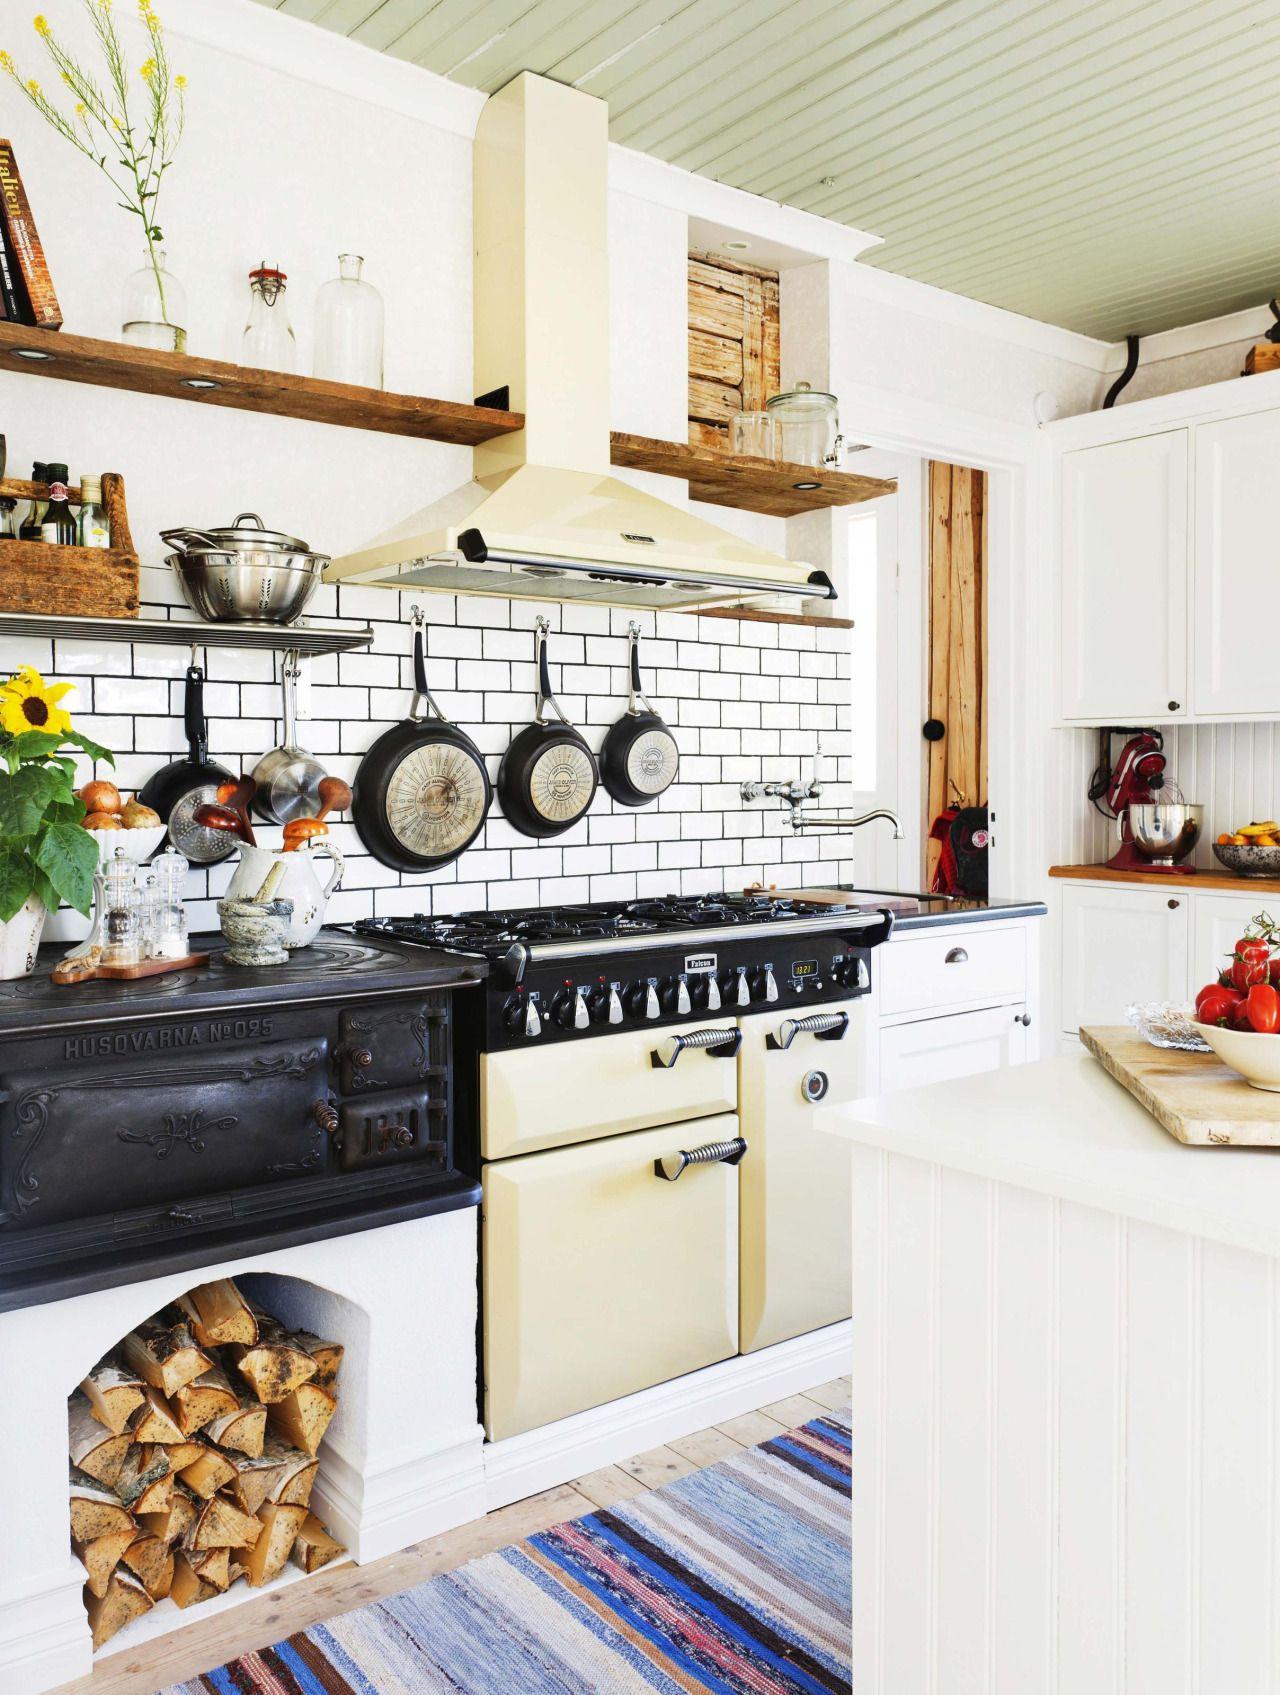 Charming Swedish Cottage   Swedish home design   Pinterest   Swedish ...